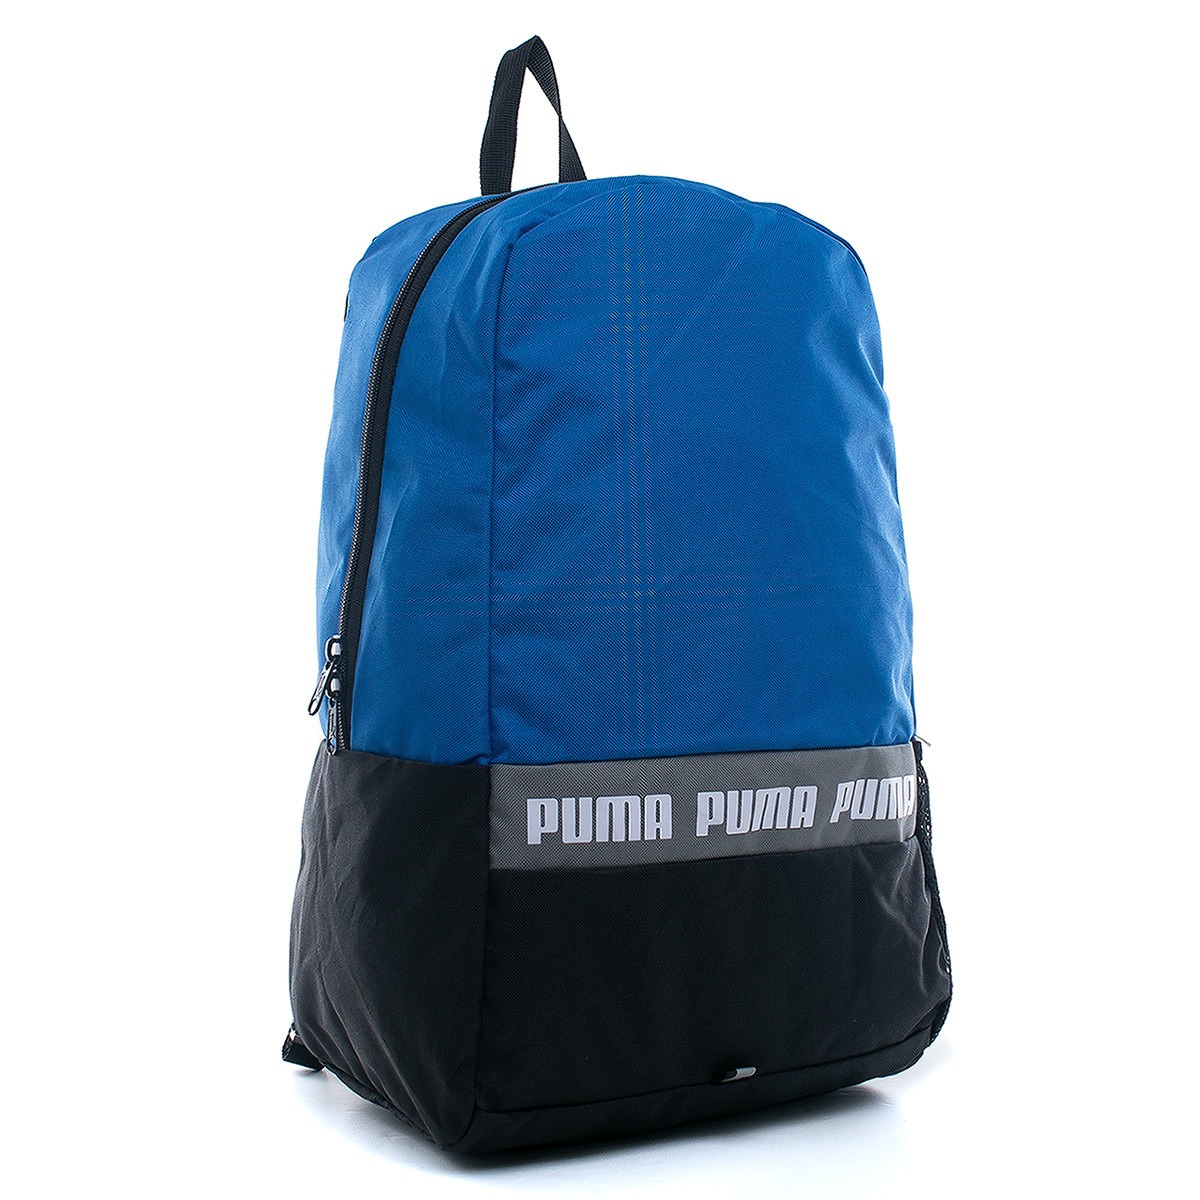 6faf0cc788 Mochila Phase Ii Puma Sport 78 Tienda Oficial - $ 889,00 en Mercado ...